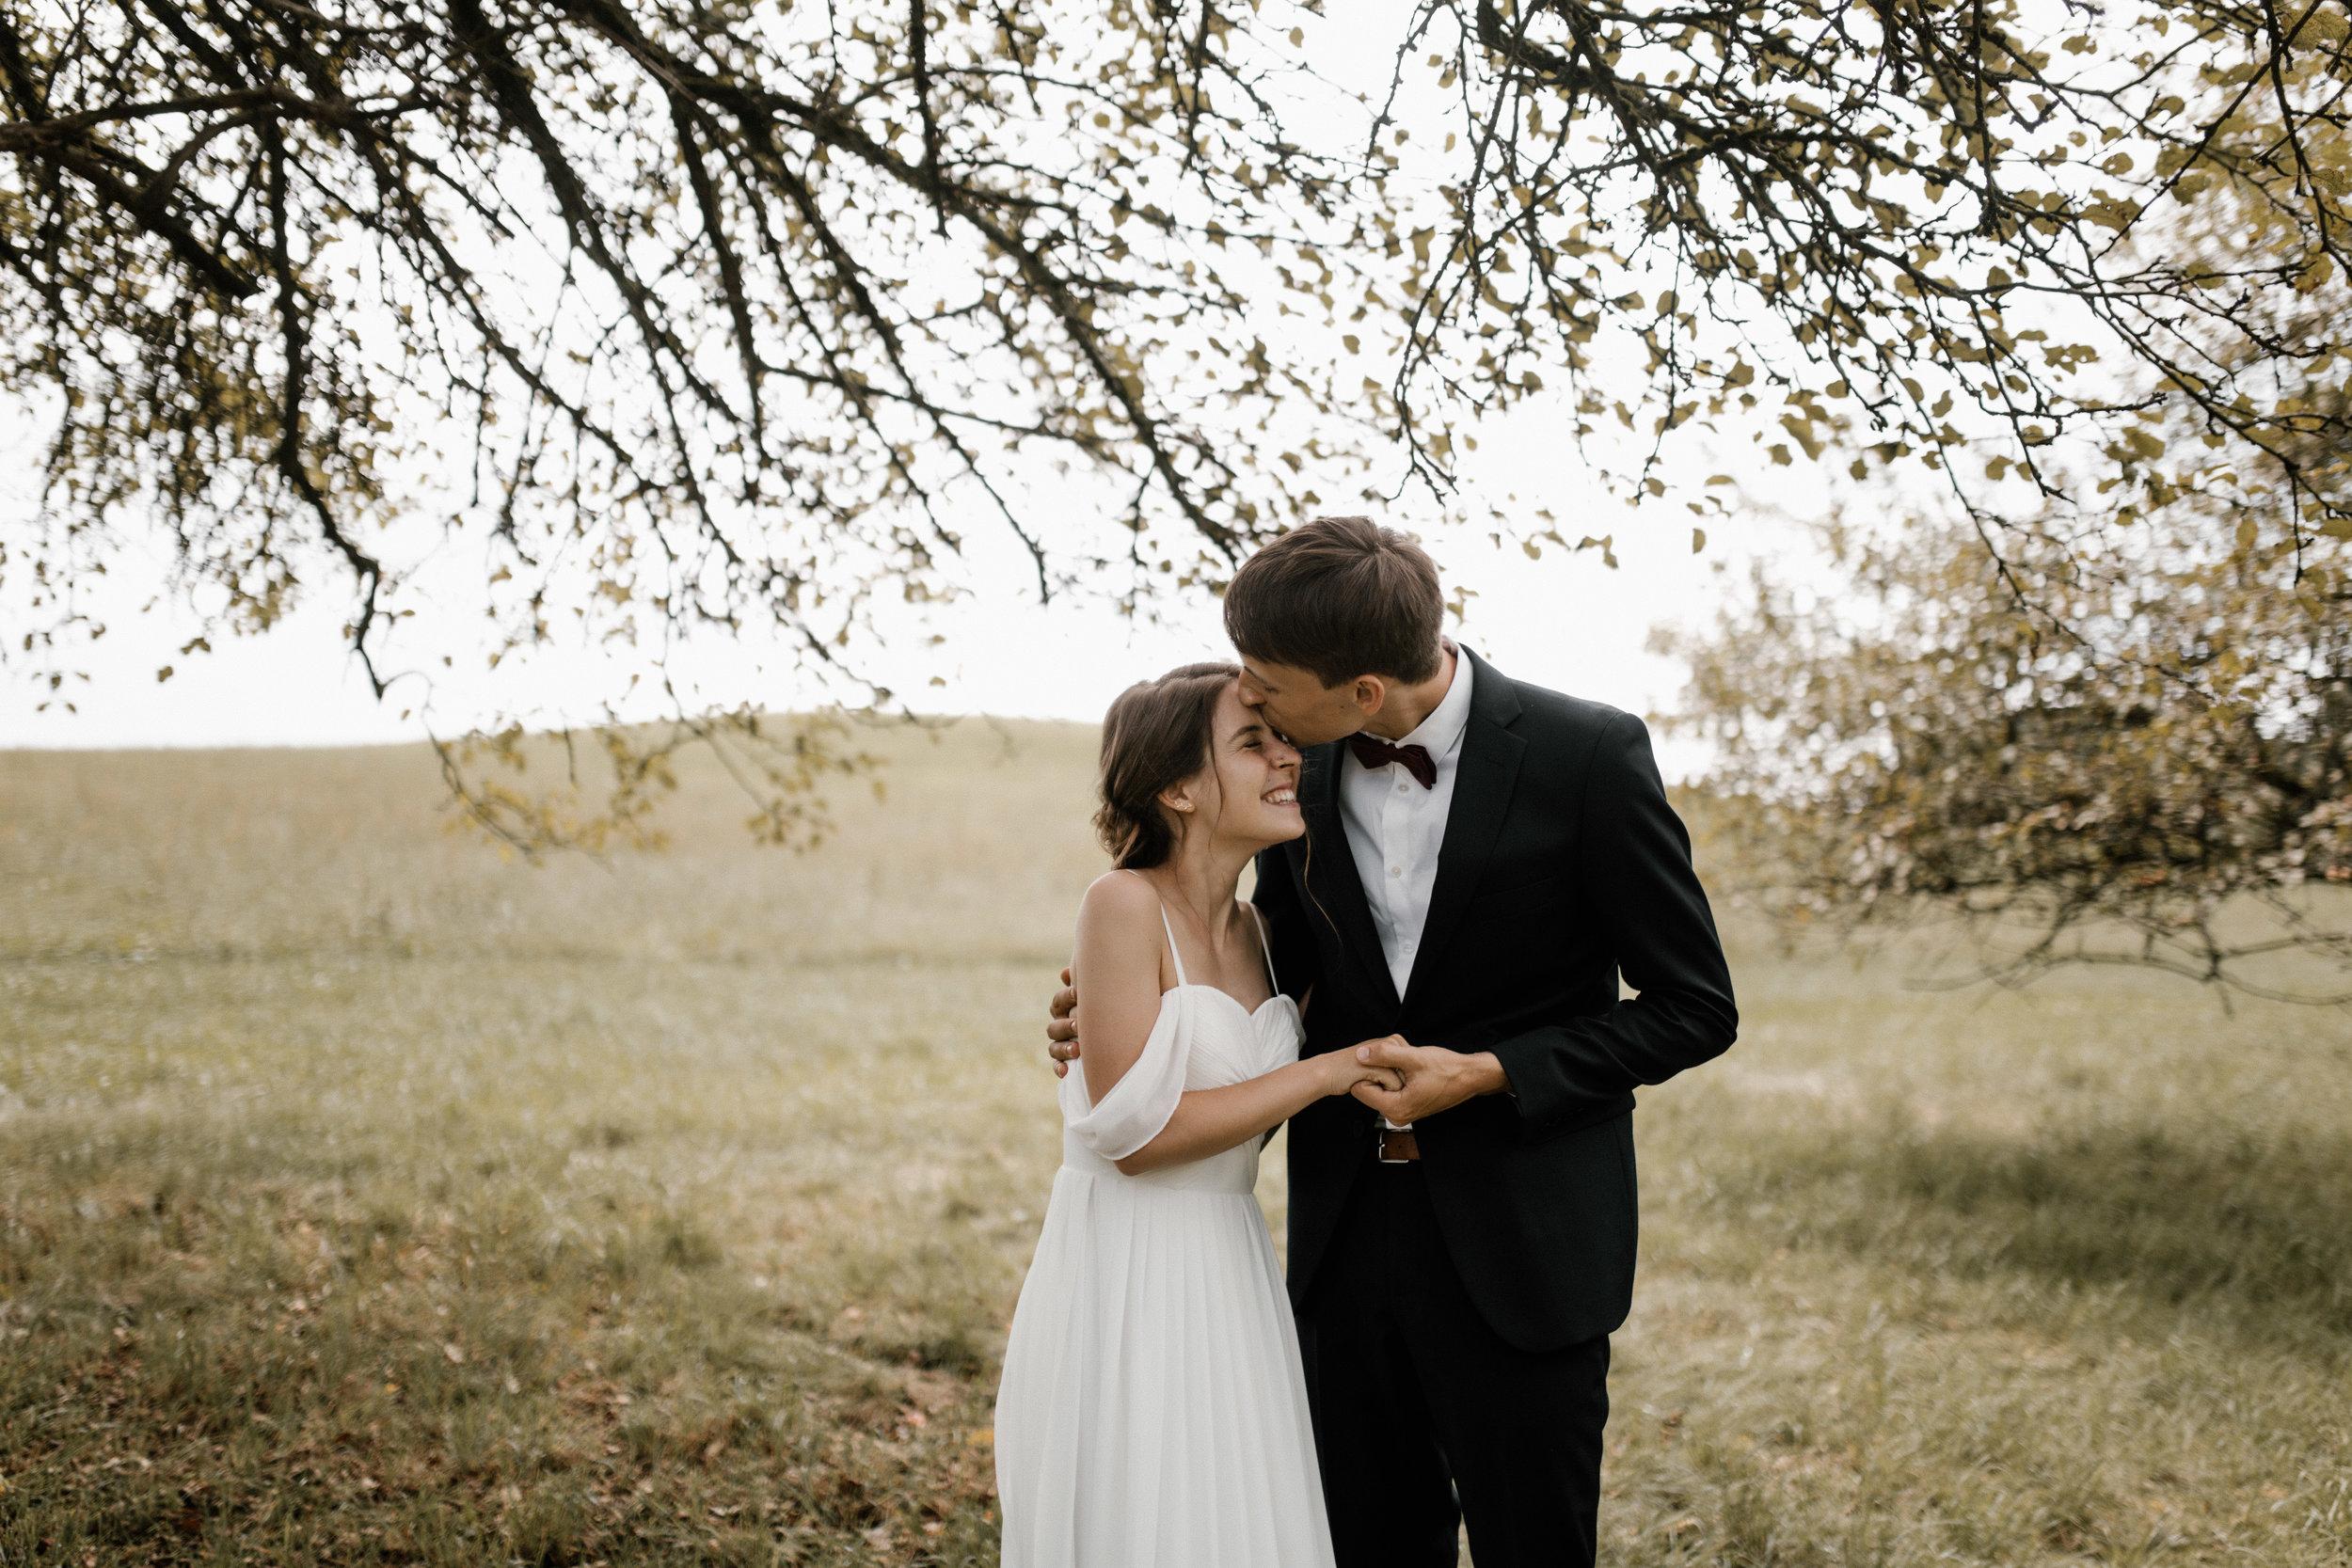 mirjam_thomas_wedding-167.jpg